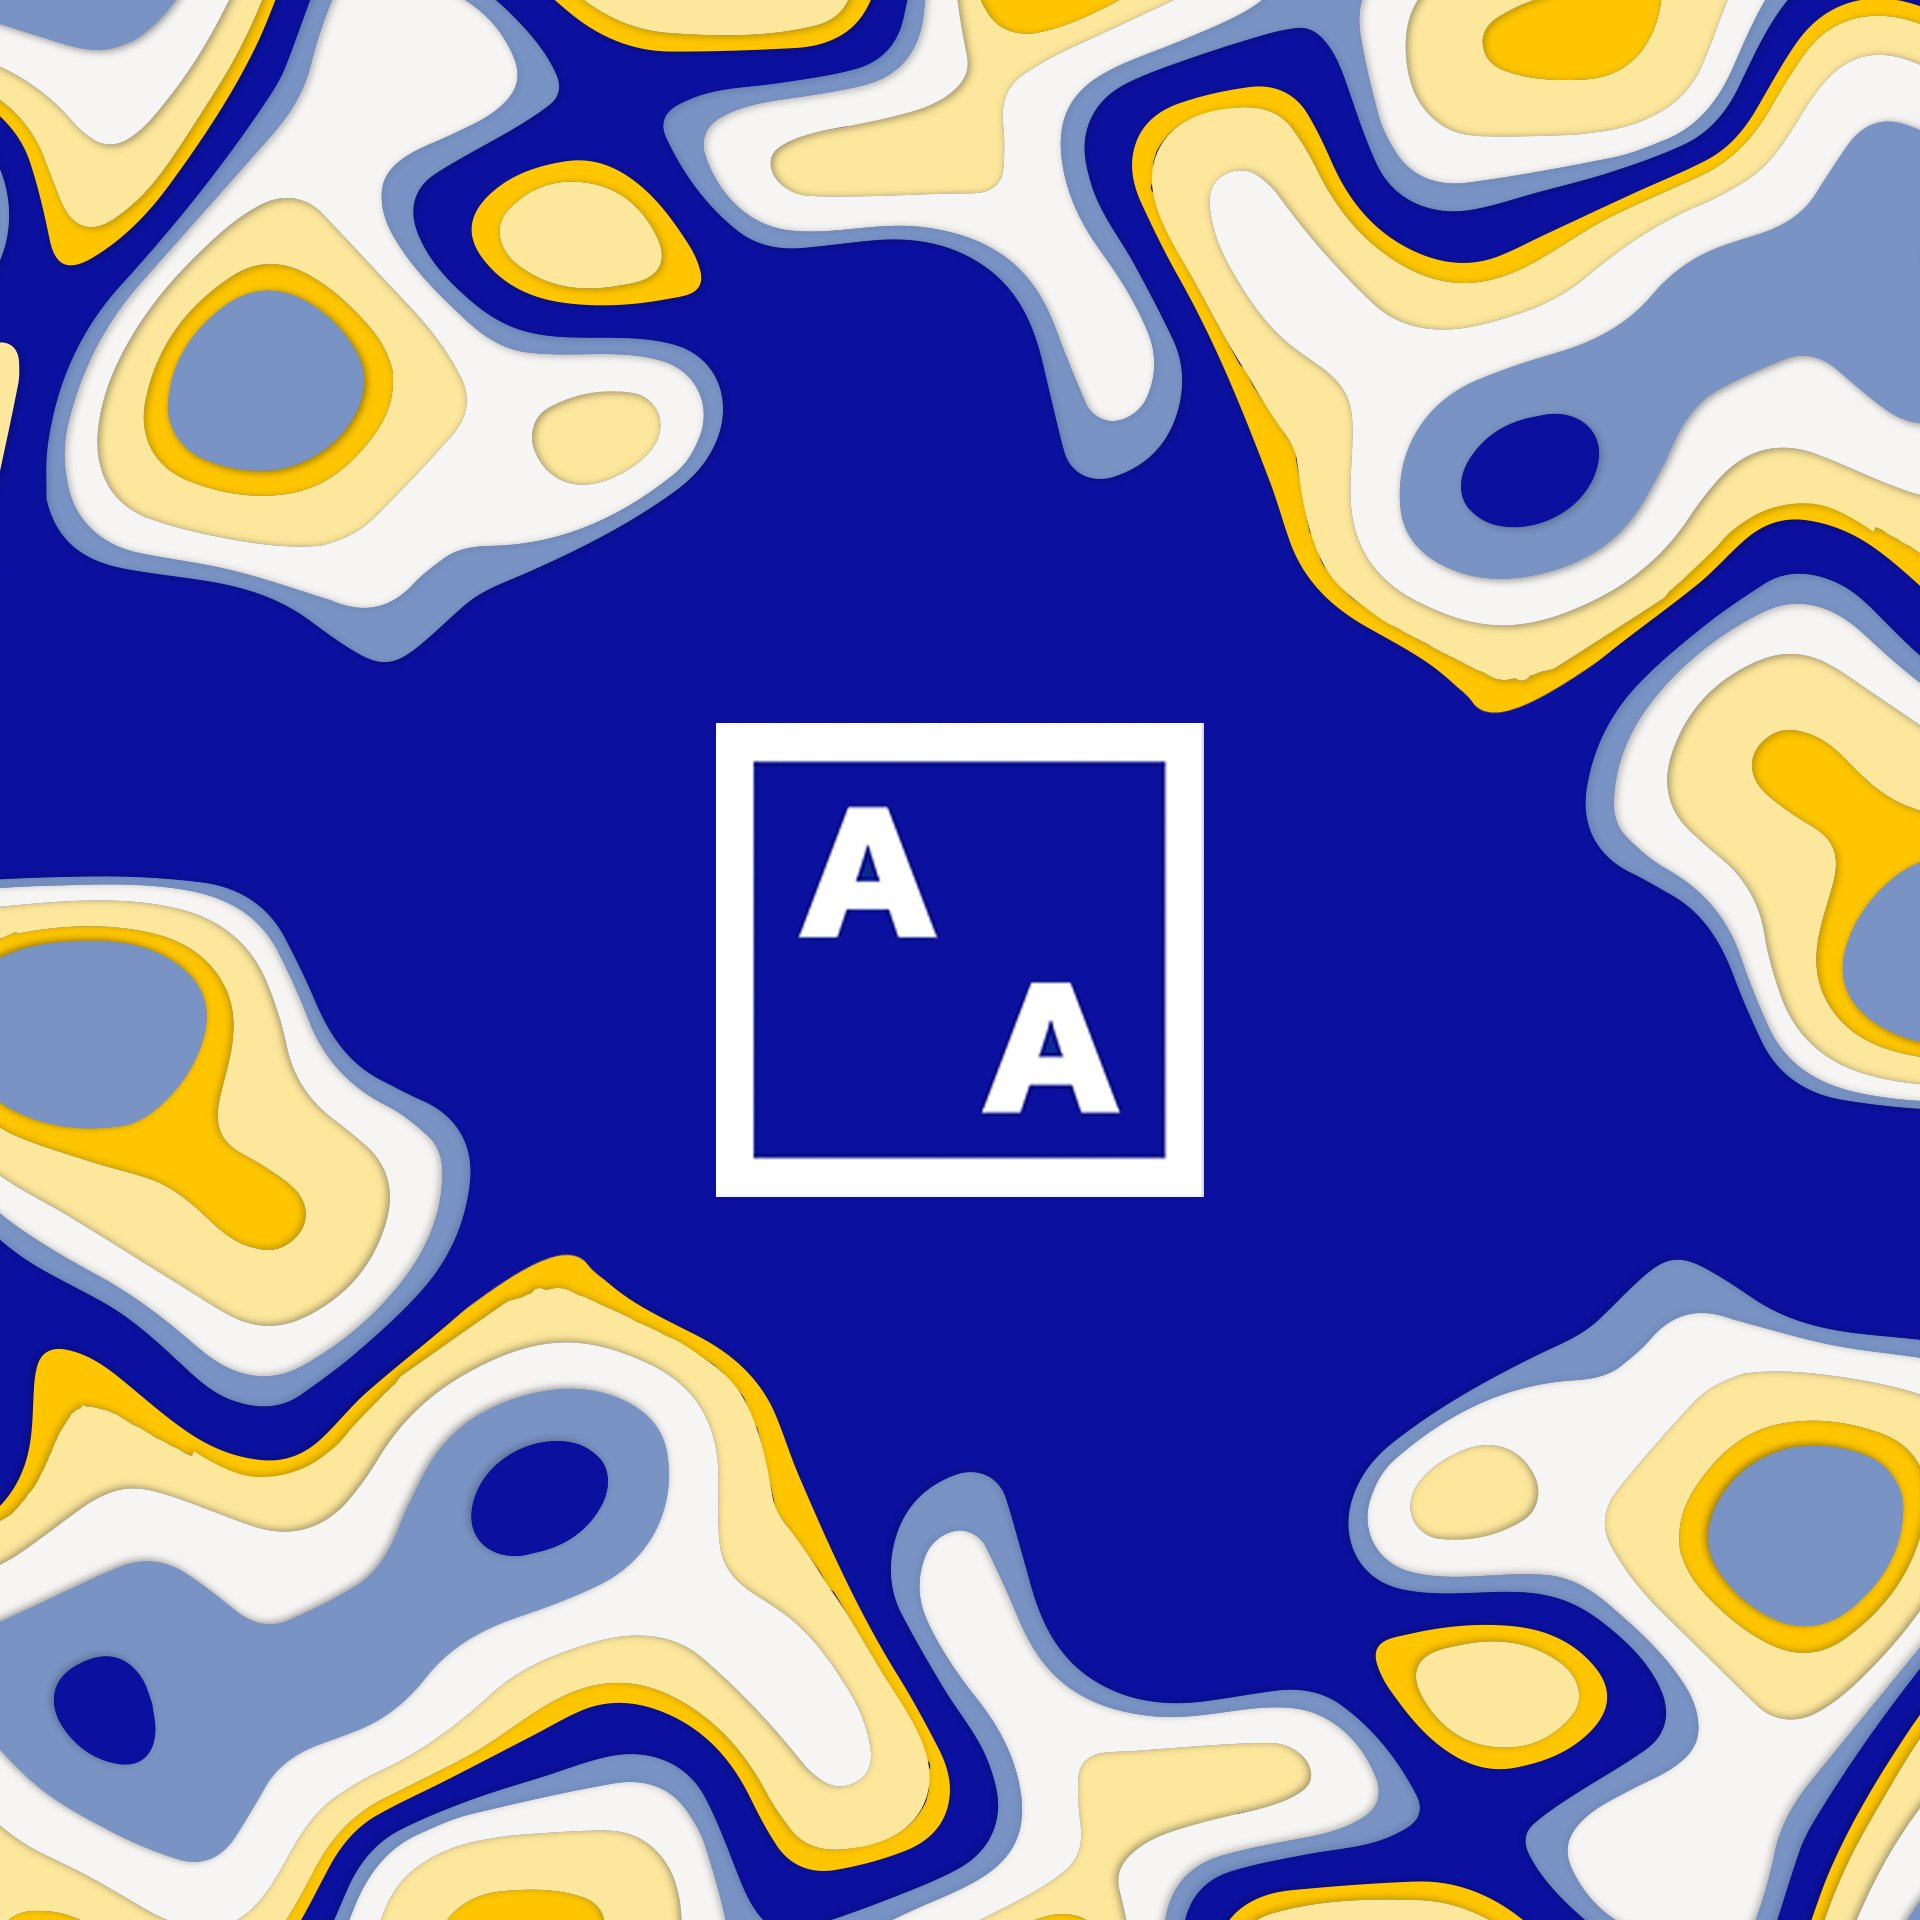 Abbiatearte,  art exhibition creativity